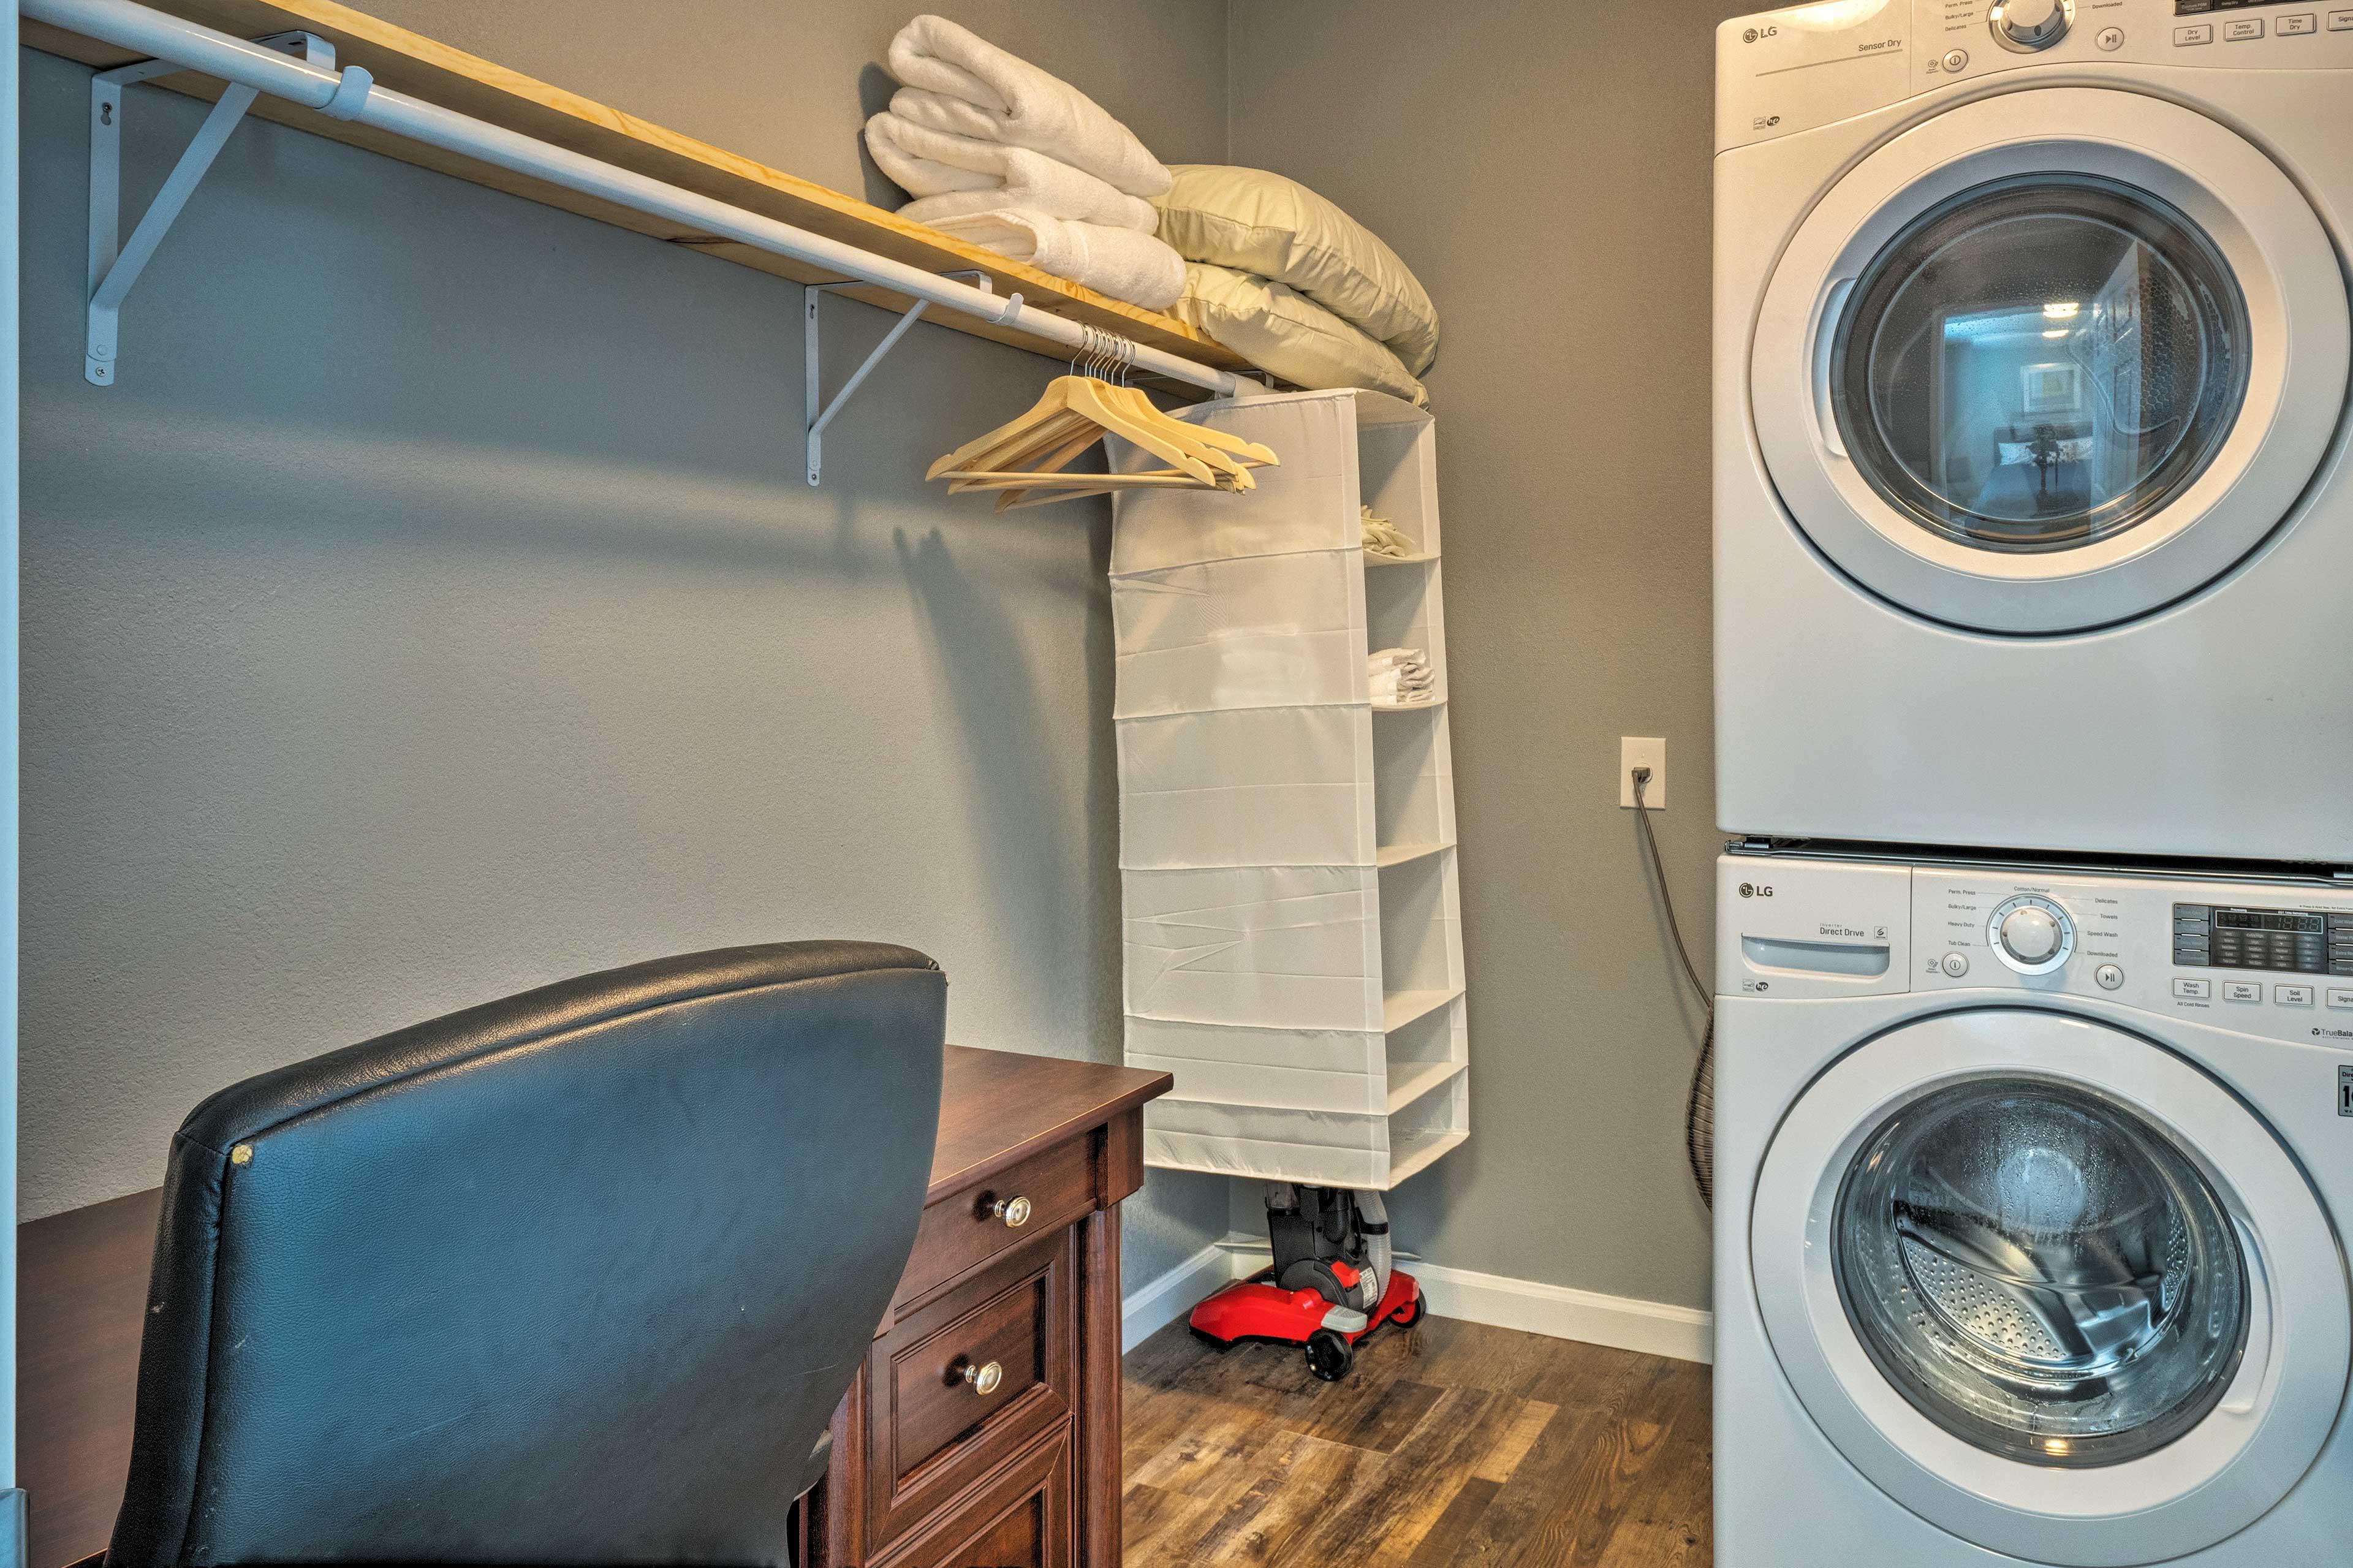 Bedroom Closet | Desk | Washer/Dryer